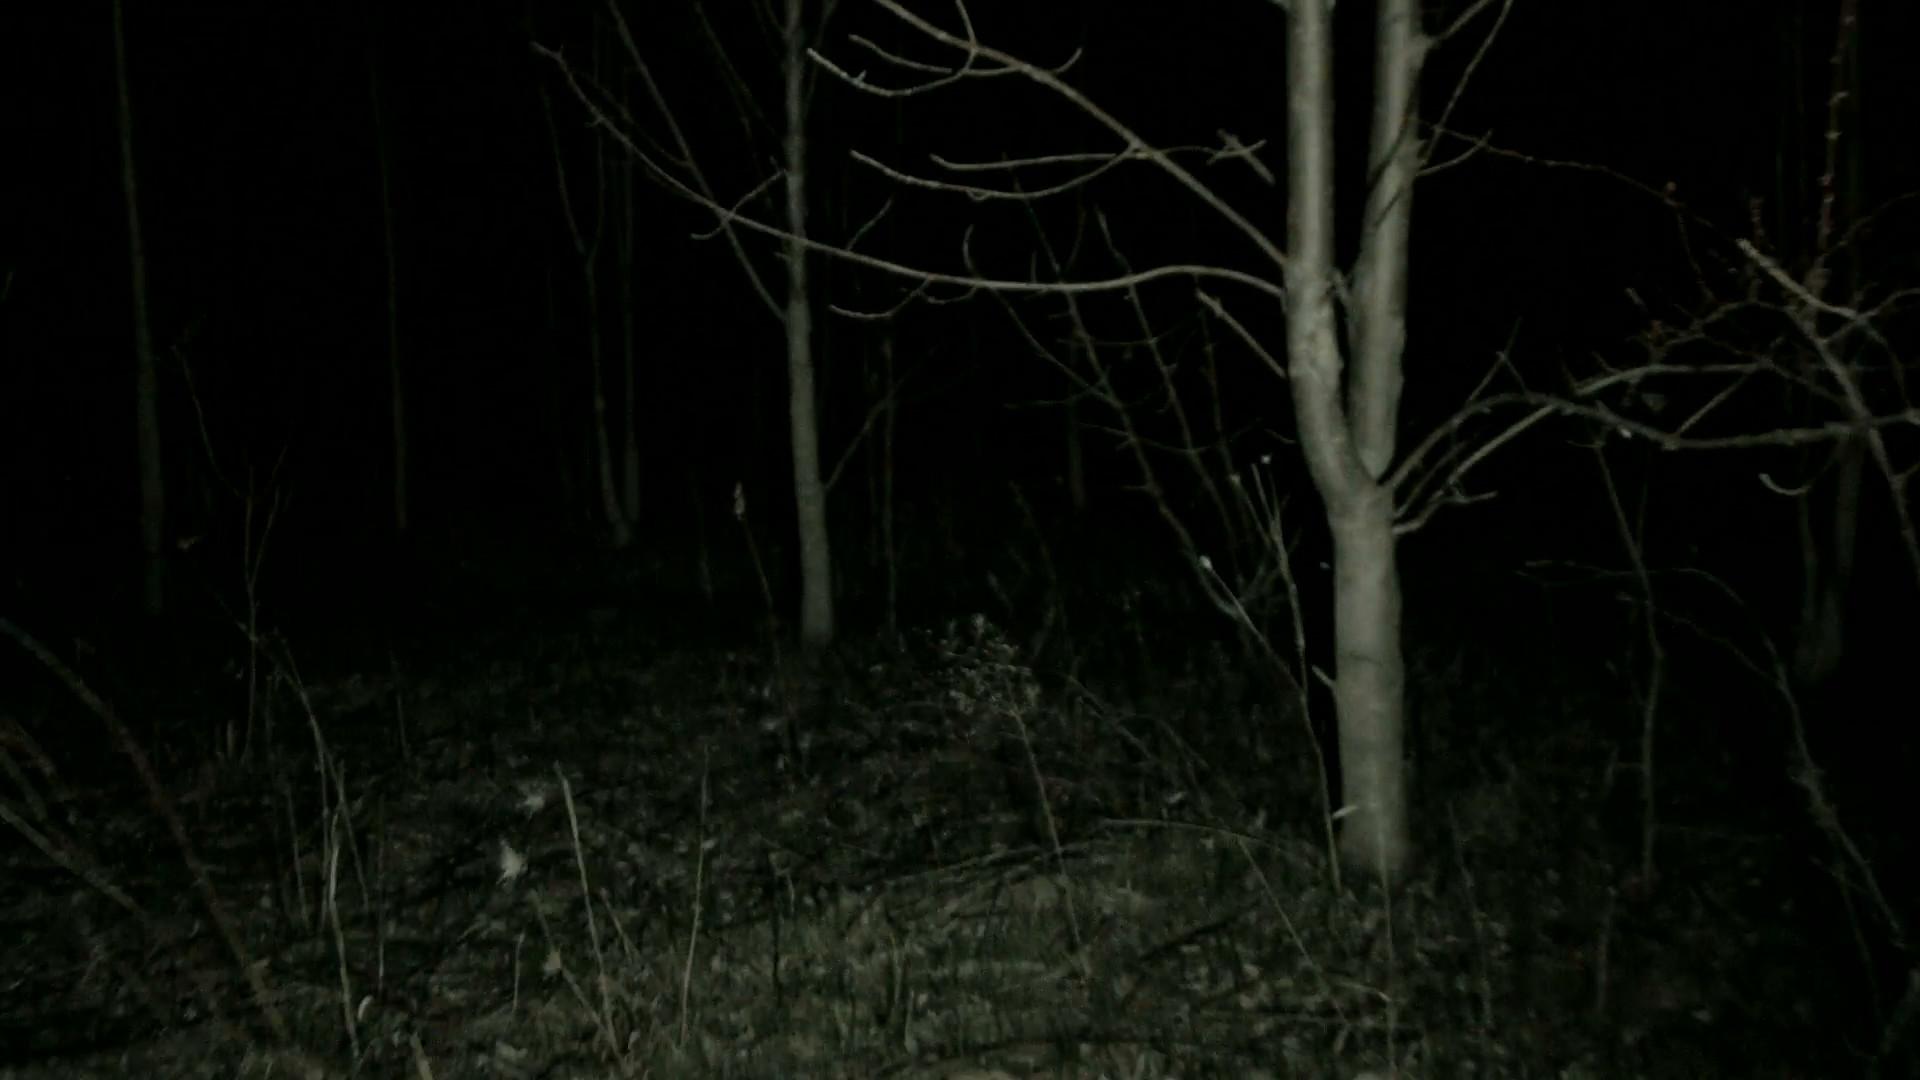 Res: 1920x1080, POV steadicam walking/running through dark spooky forest at night Stock  Video Footage - Videoblocks